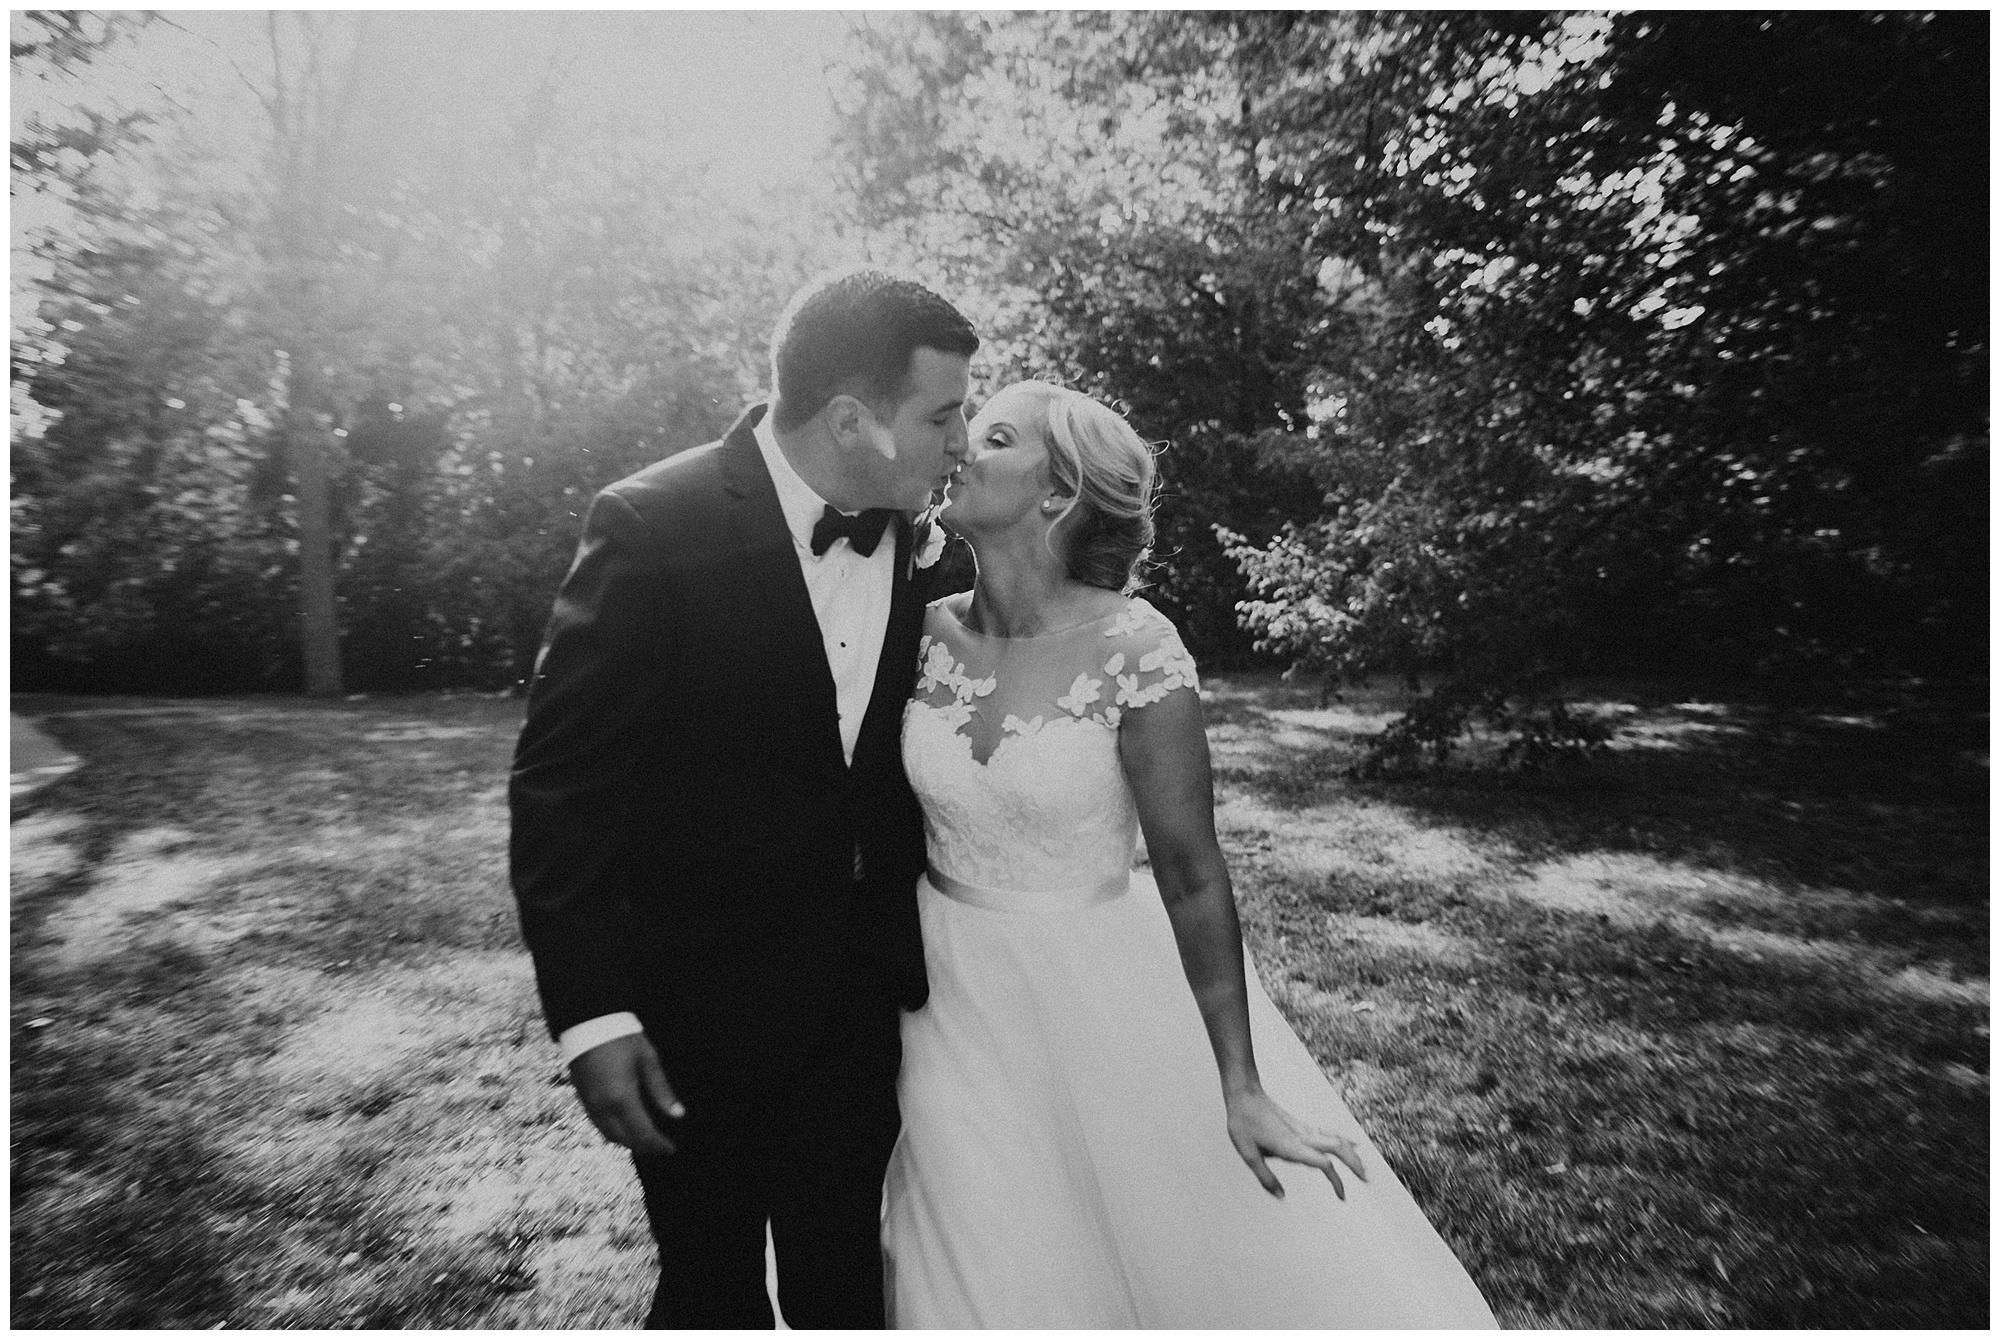 pear_tree_estate_wedding_champaign_il_wright_photographs_jj_0049.jpg